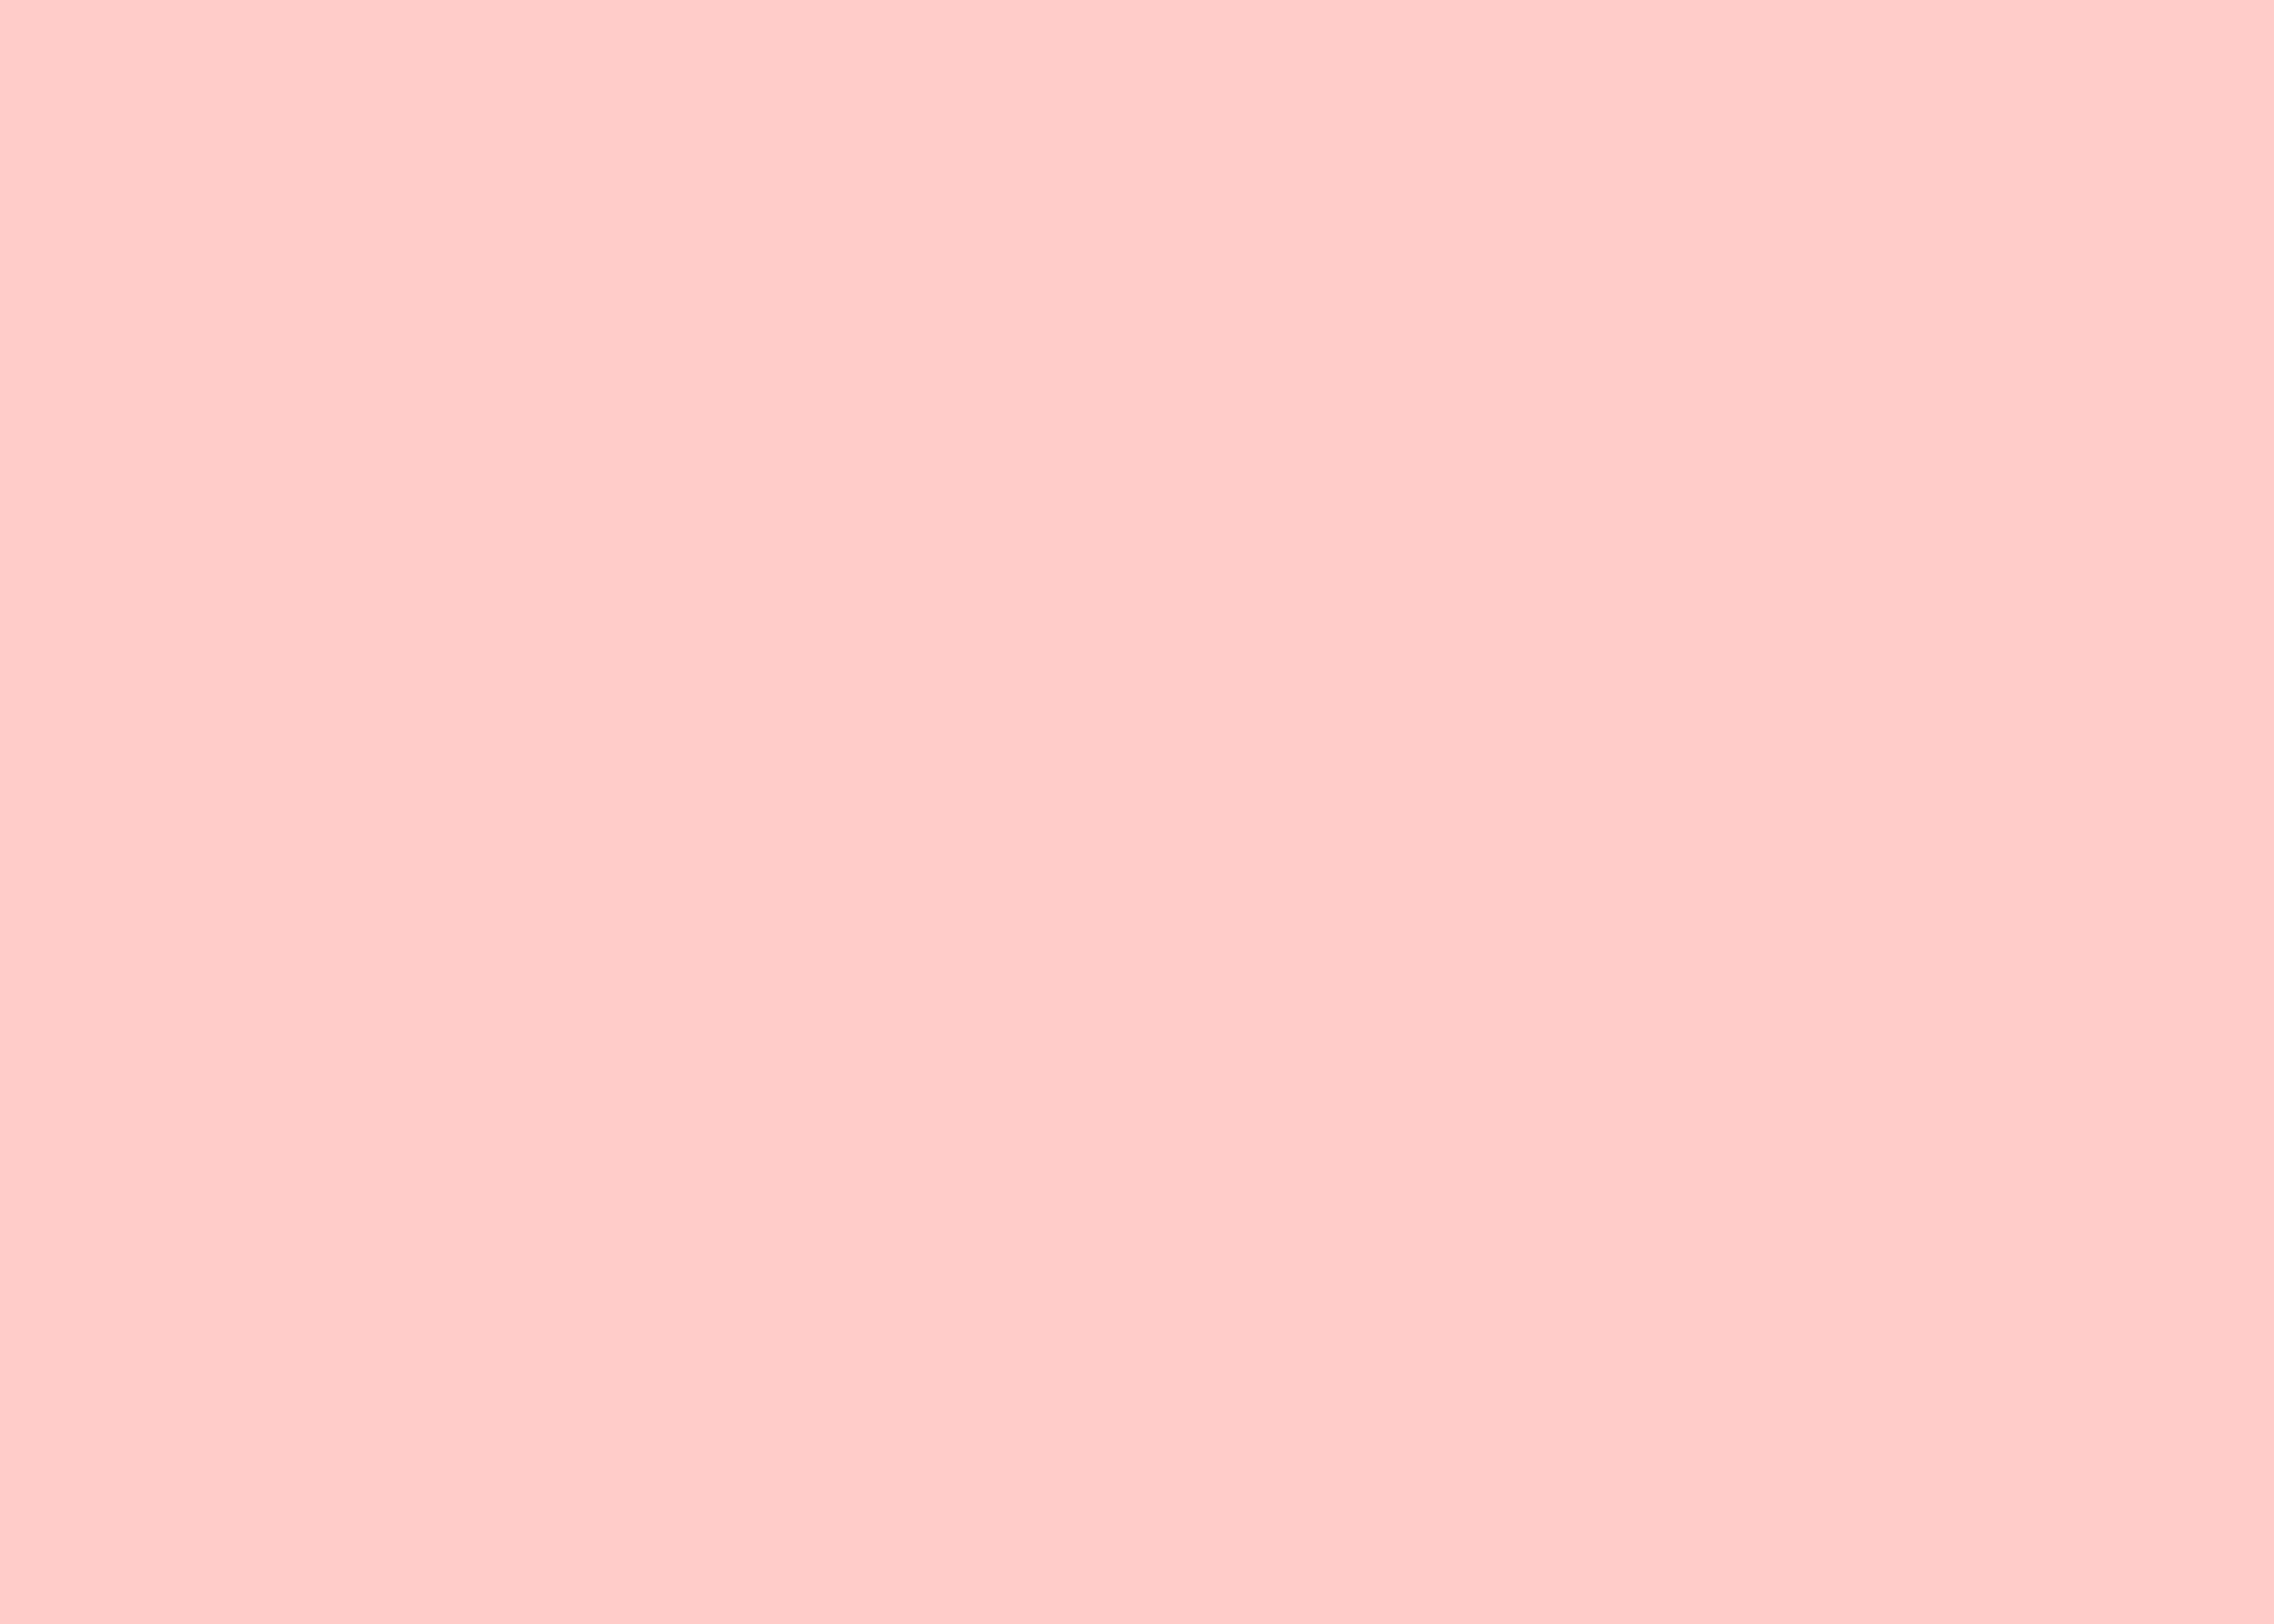 Pale Pink Wikipedia 壁紙 ピンク 壁紙 かわいい シンプル壁紙